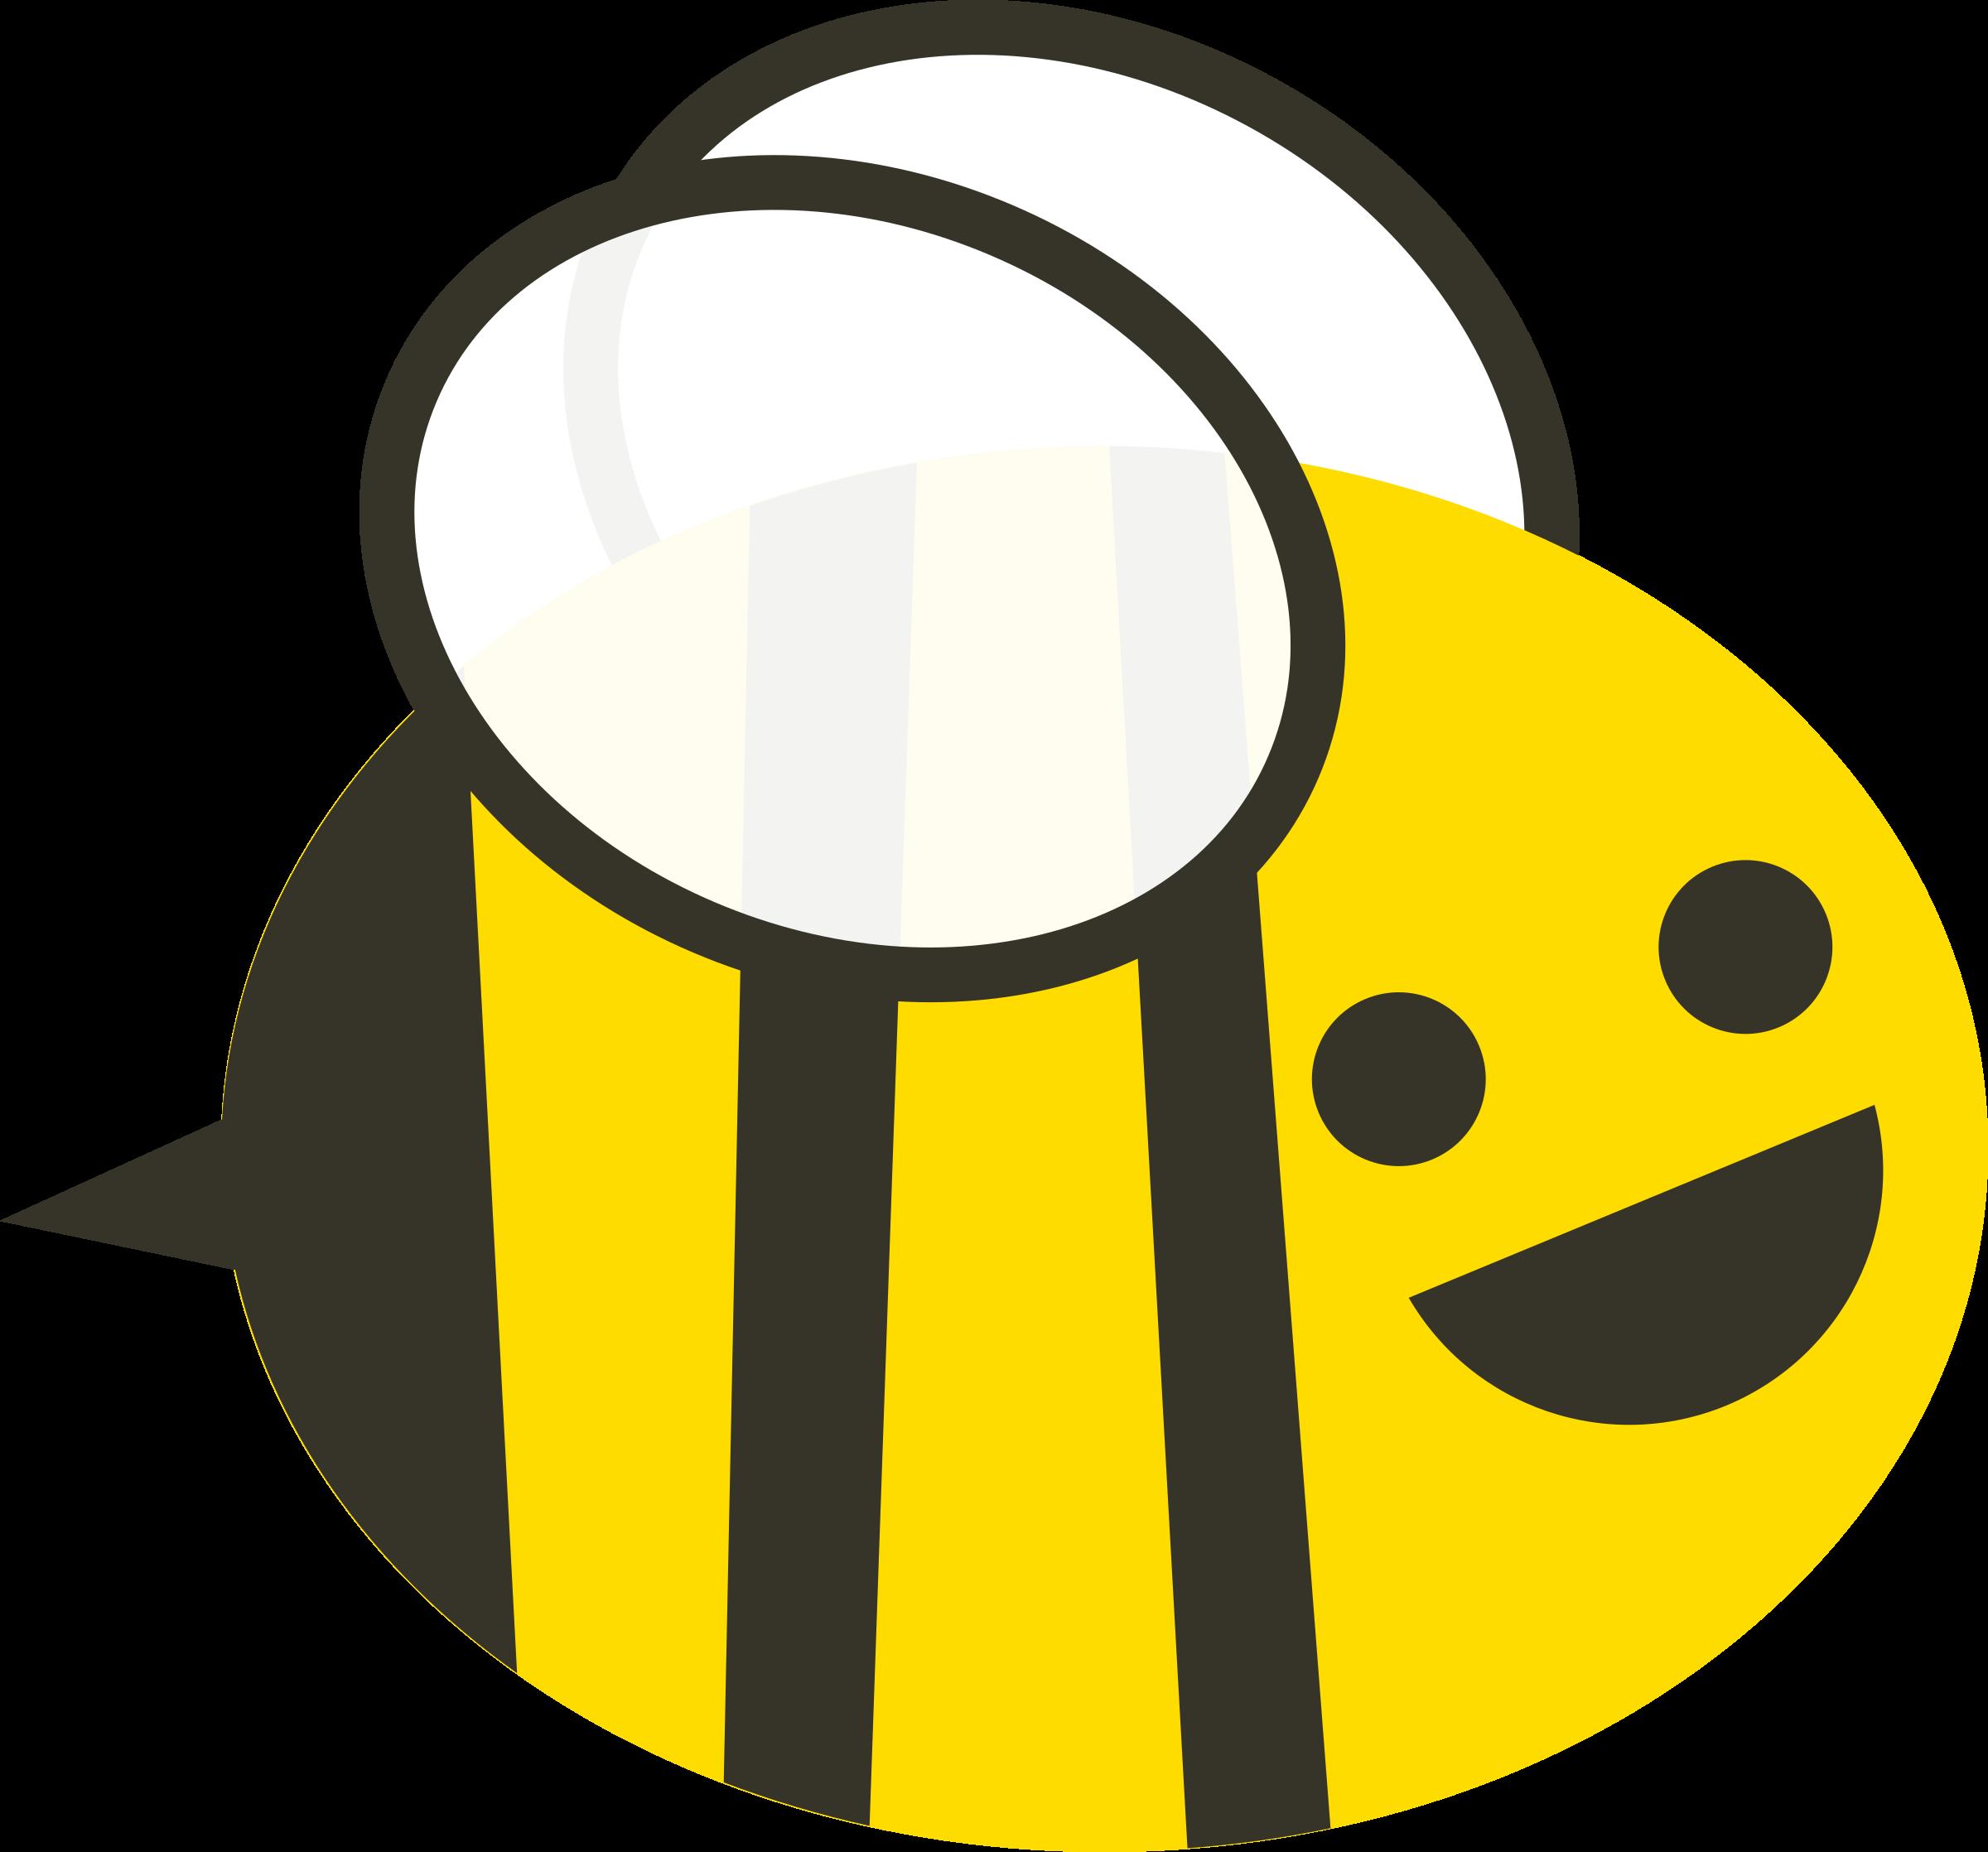 2400x2236 Cartoon Bee Vector Art Image